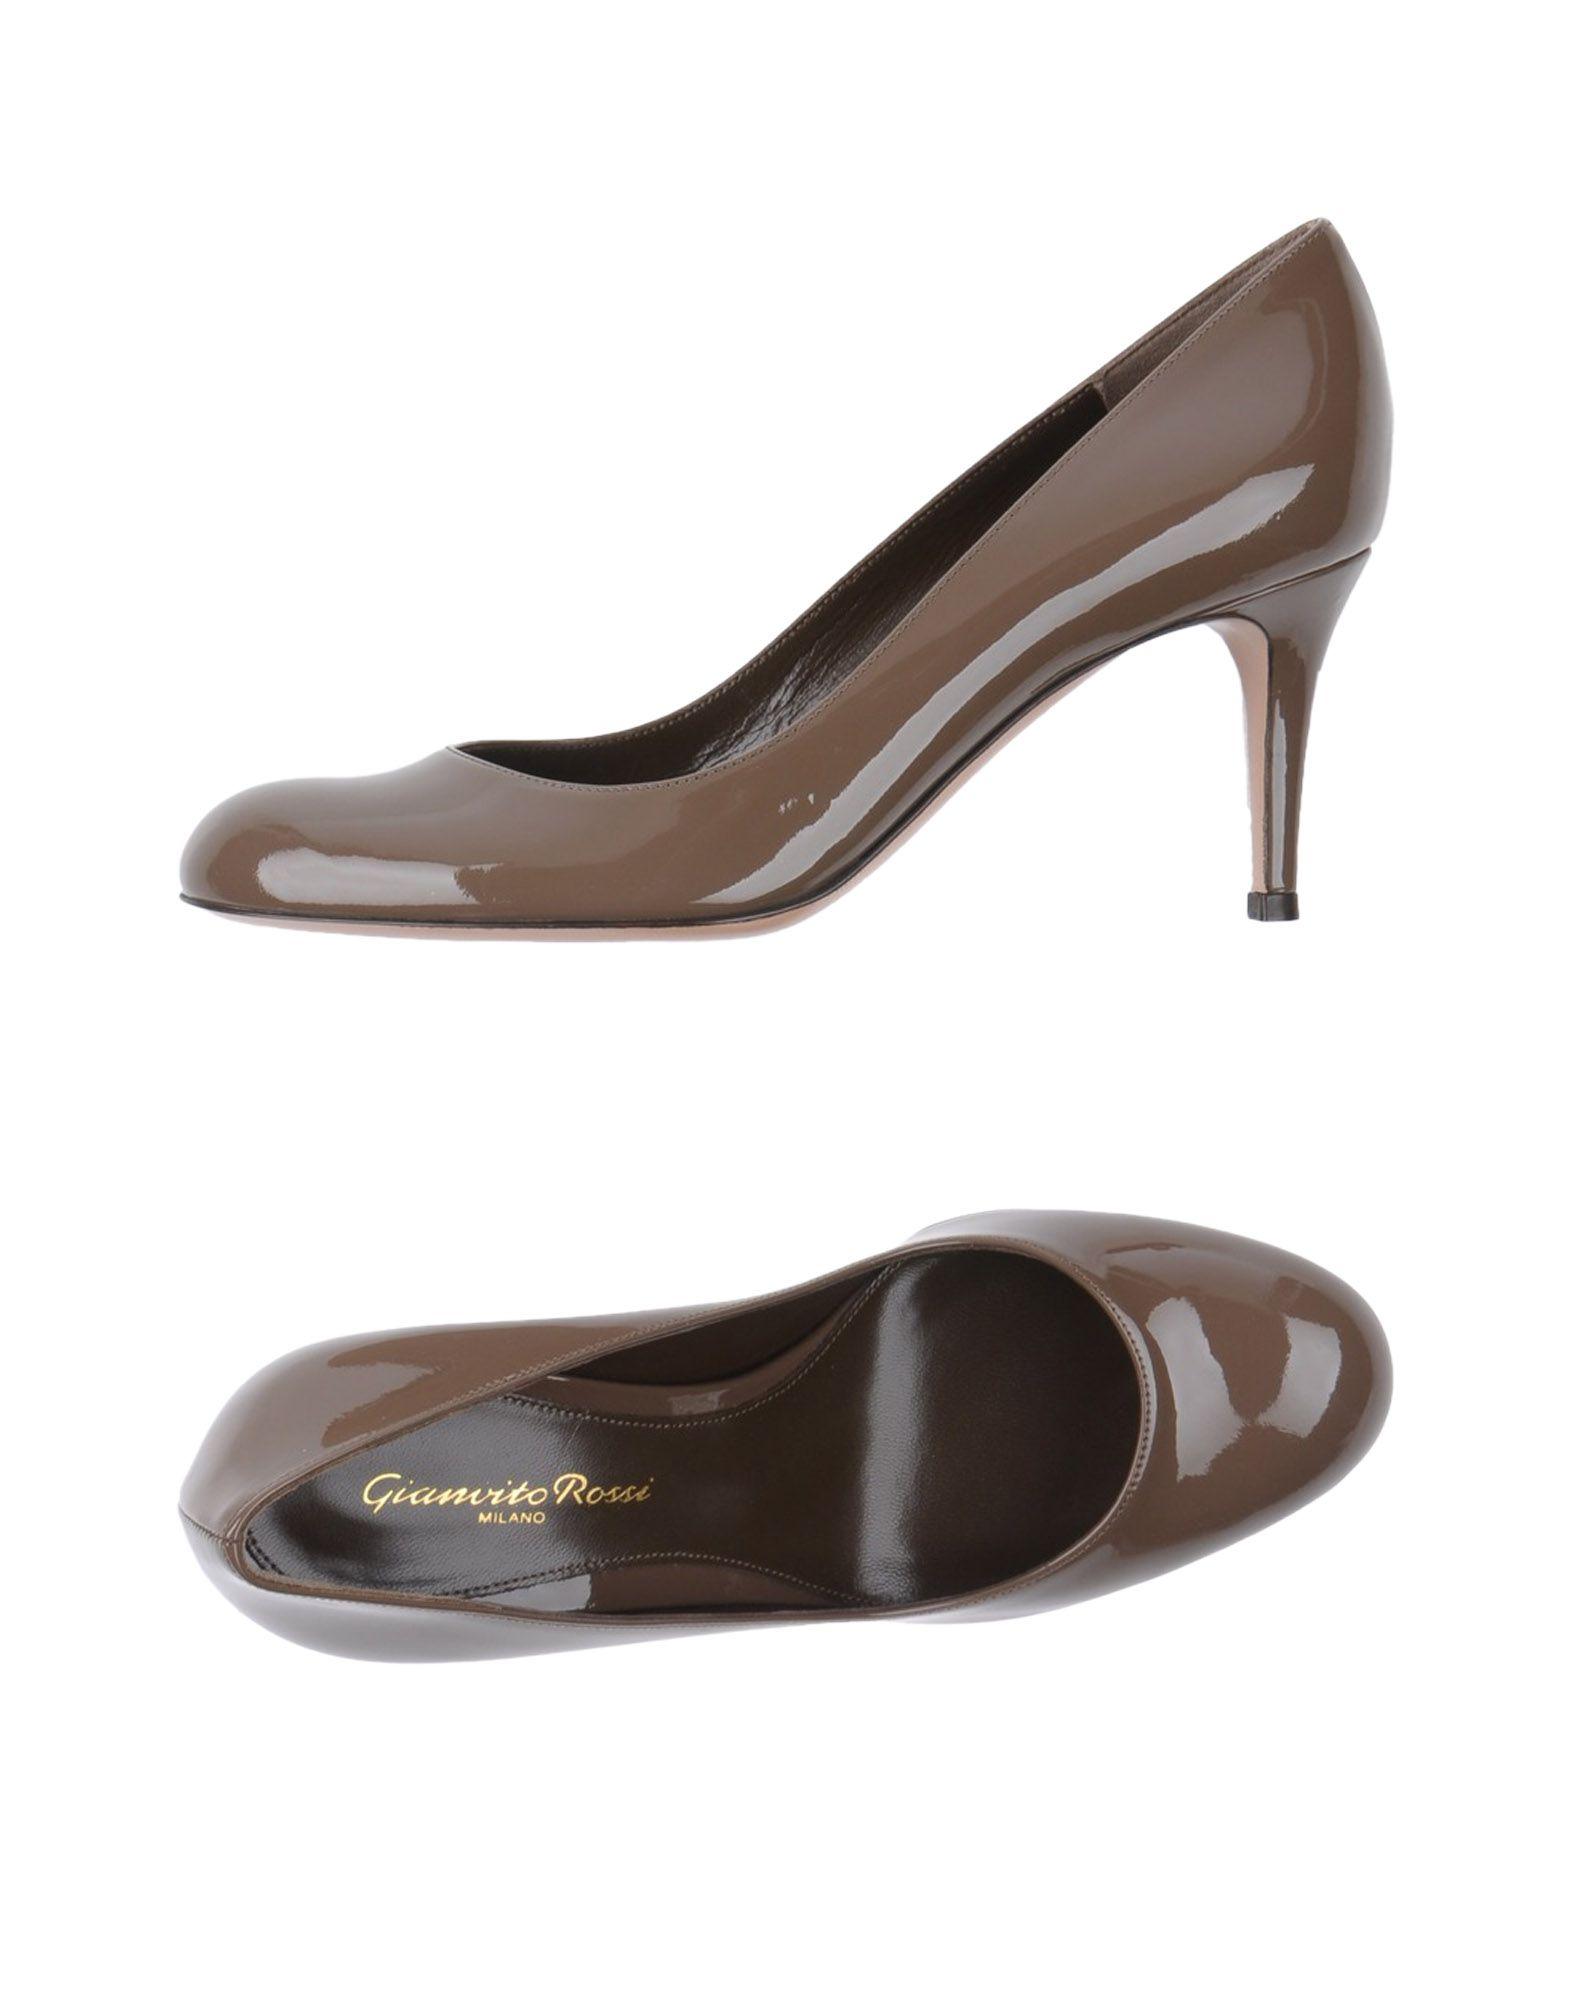 Rabatt Schuhe Gianvito Rossi Pumps Damen  11177202FE 11177202FE 11177202FE 5bec68